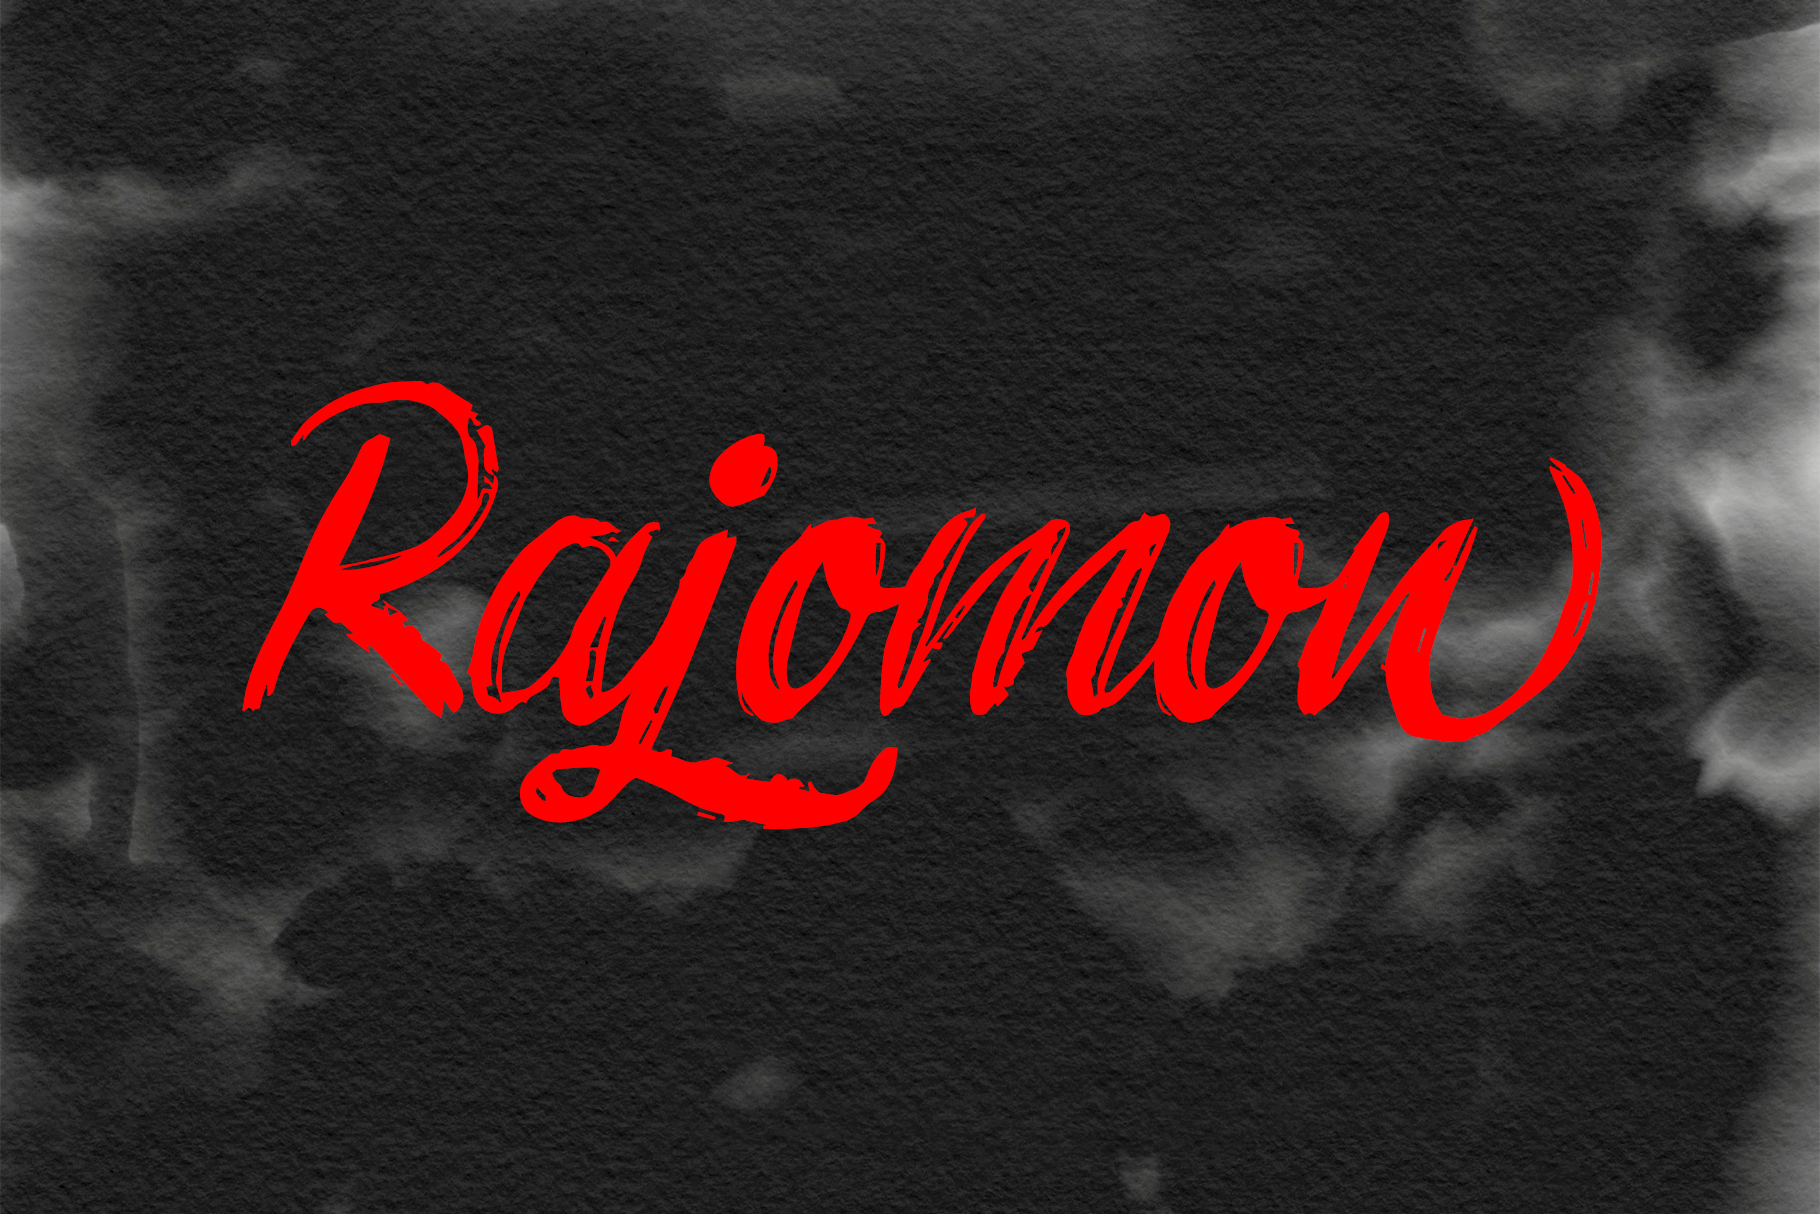 Rajmon example image 1